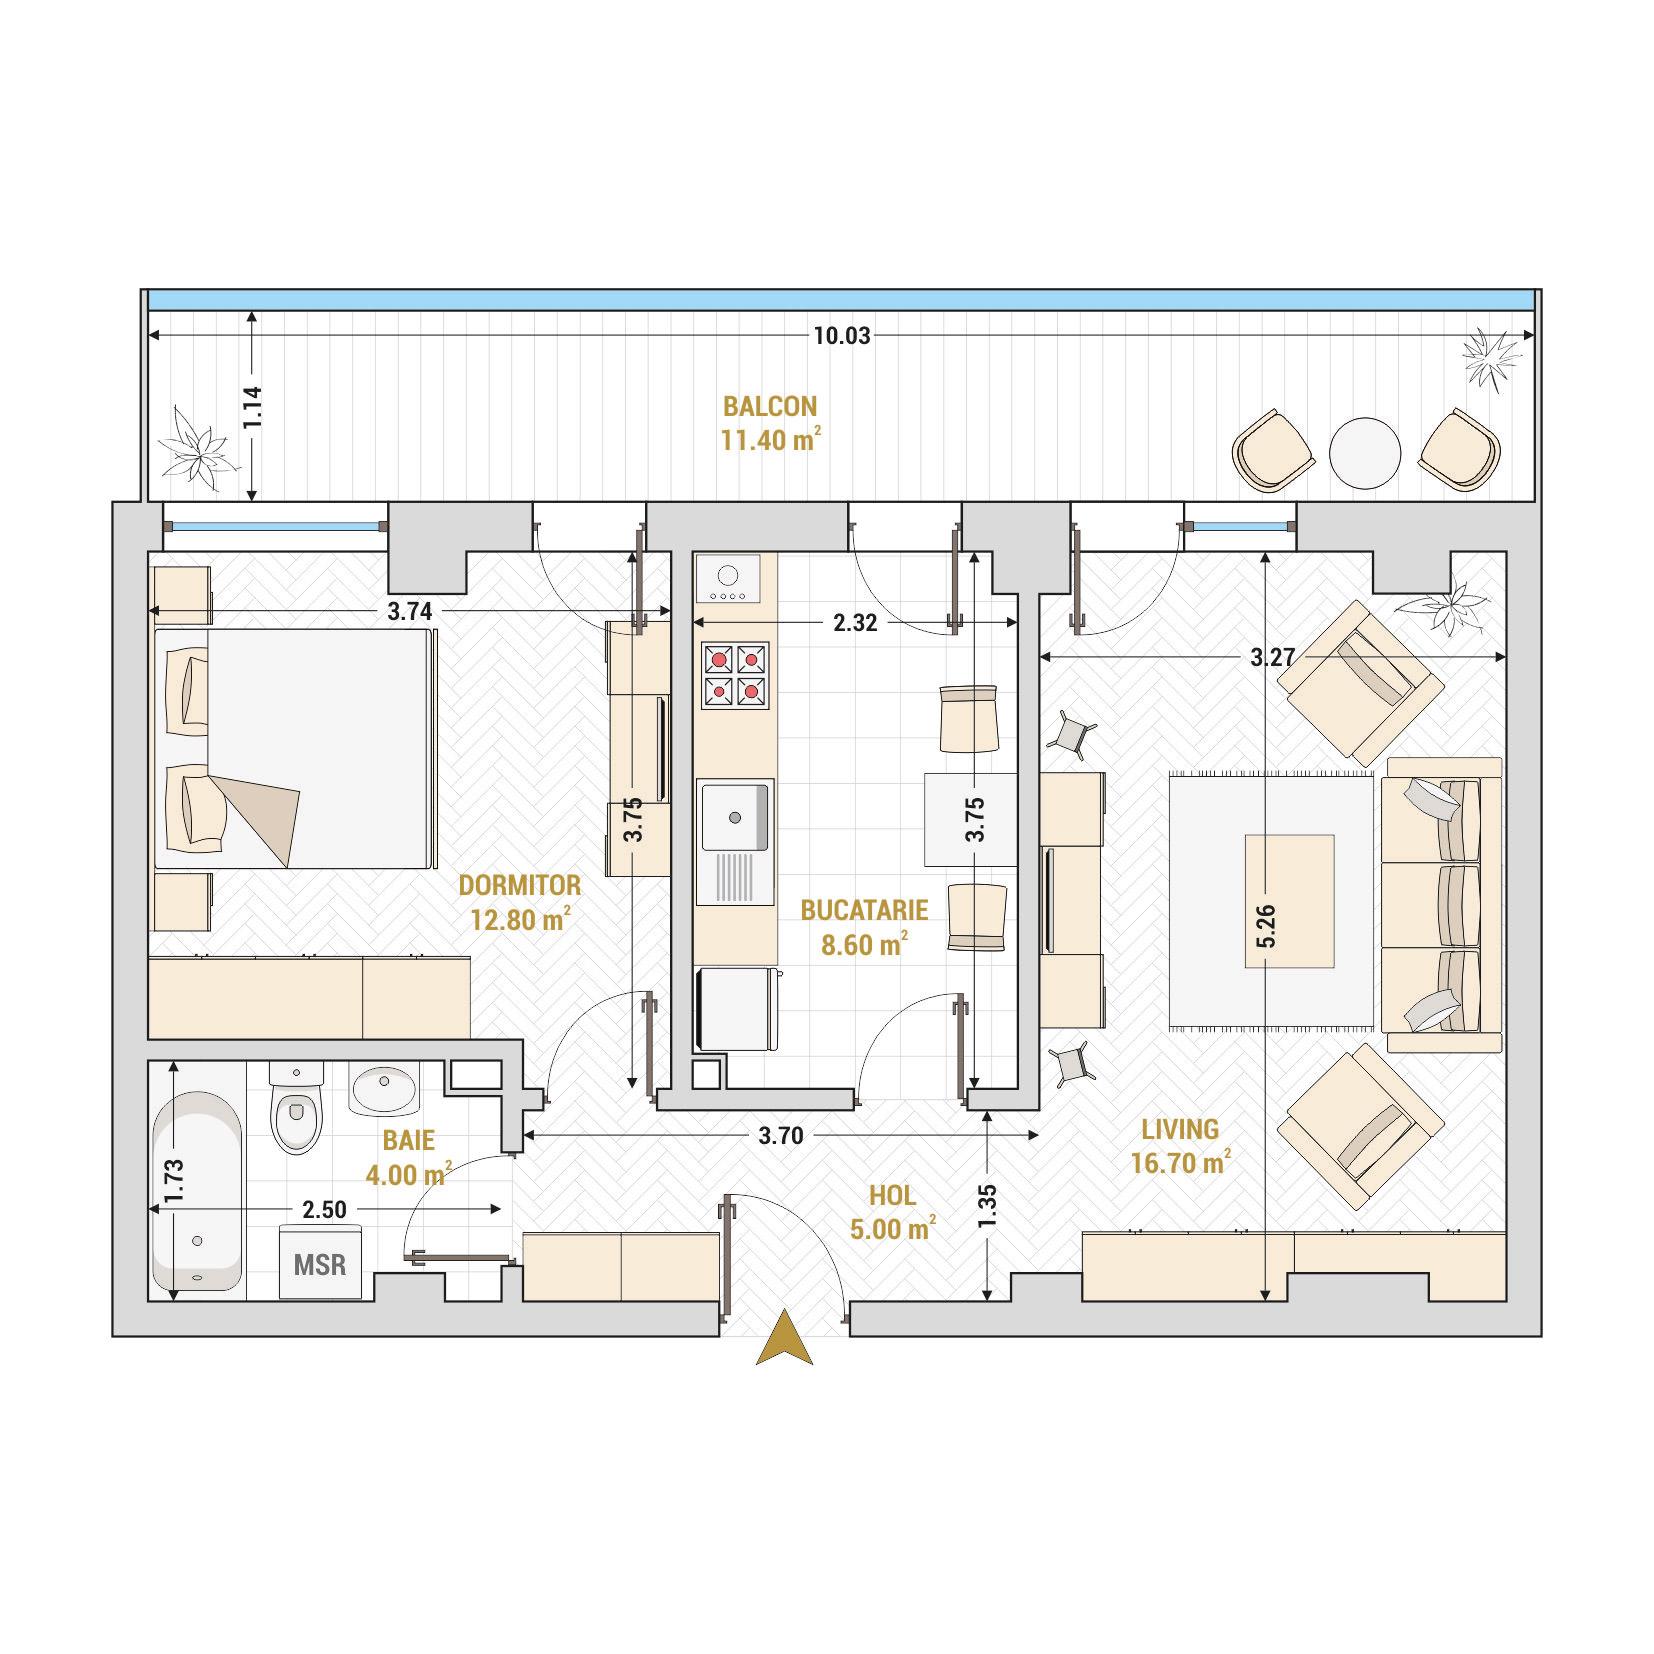 Apartamente cu 2 camere Bucuresti - Catedral Residence - Marriott, Piata Unirii, 13 Septembrie, Izvor - Suprafata utila totala - 58.50 metri patrati